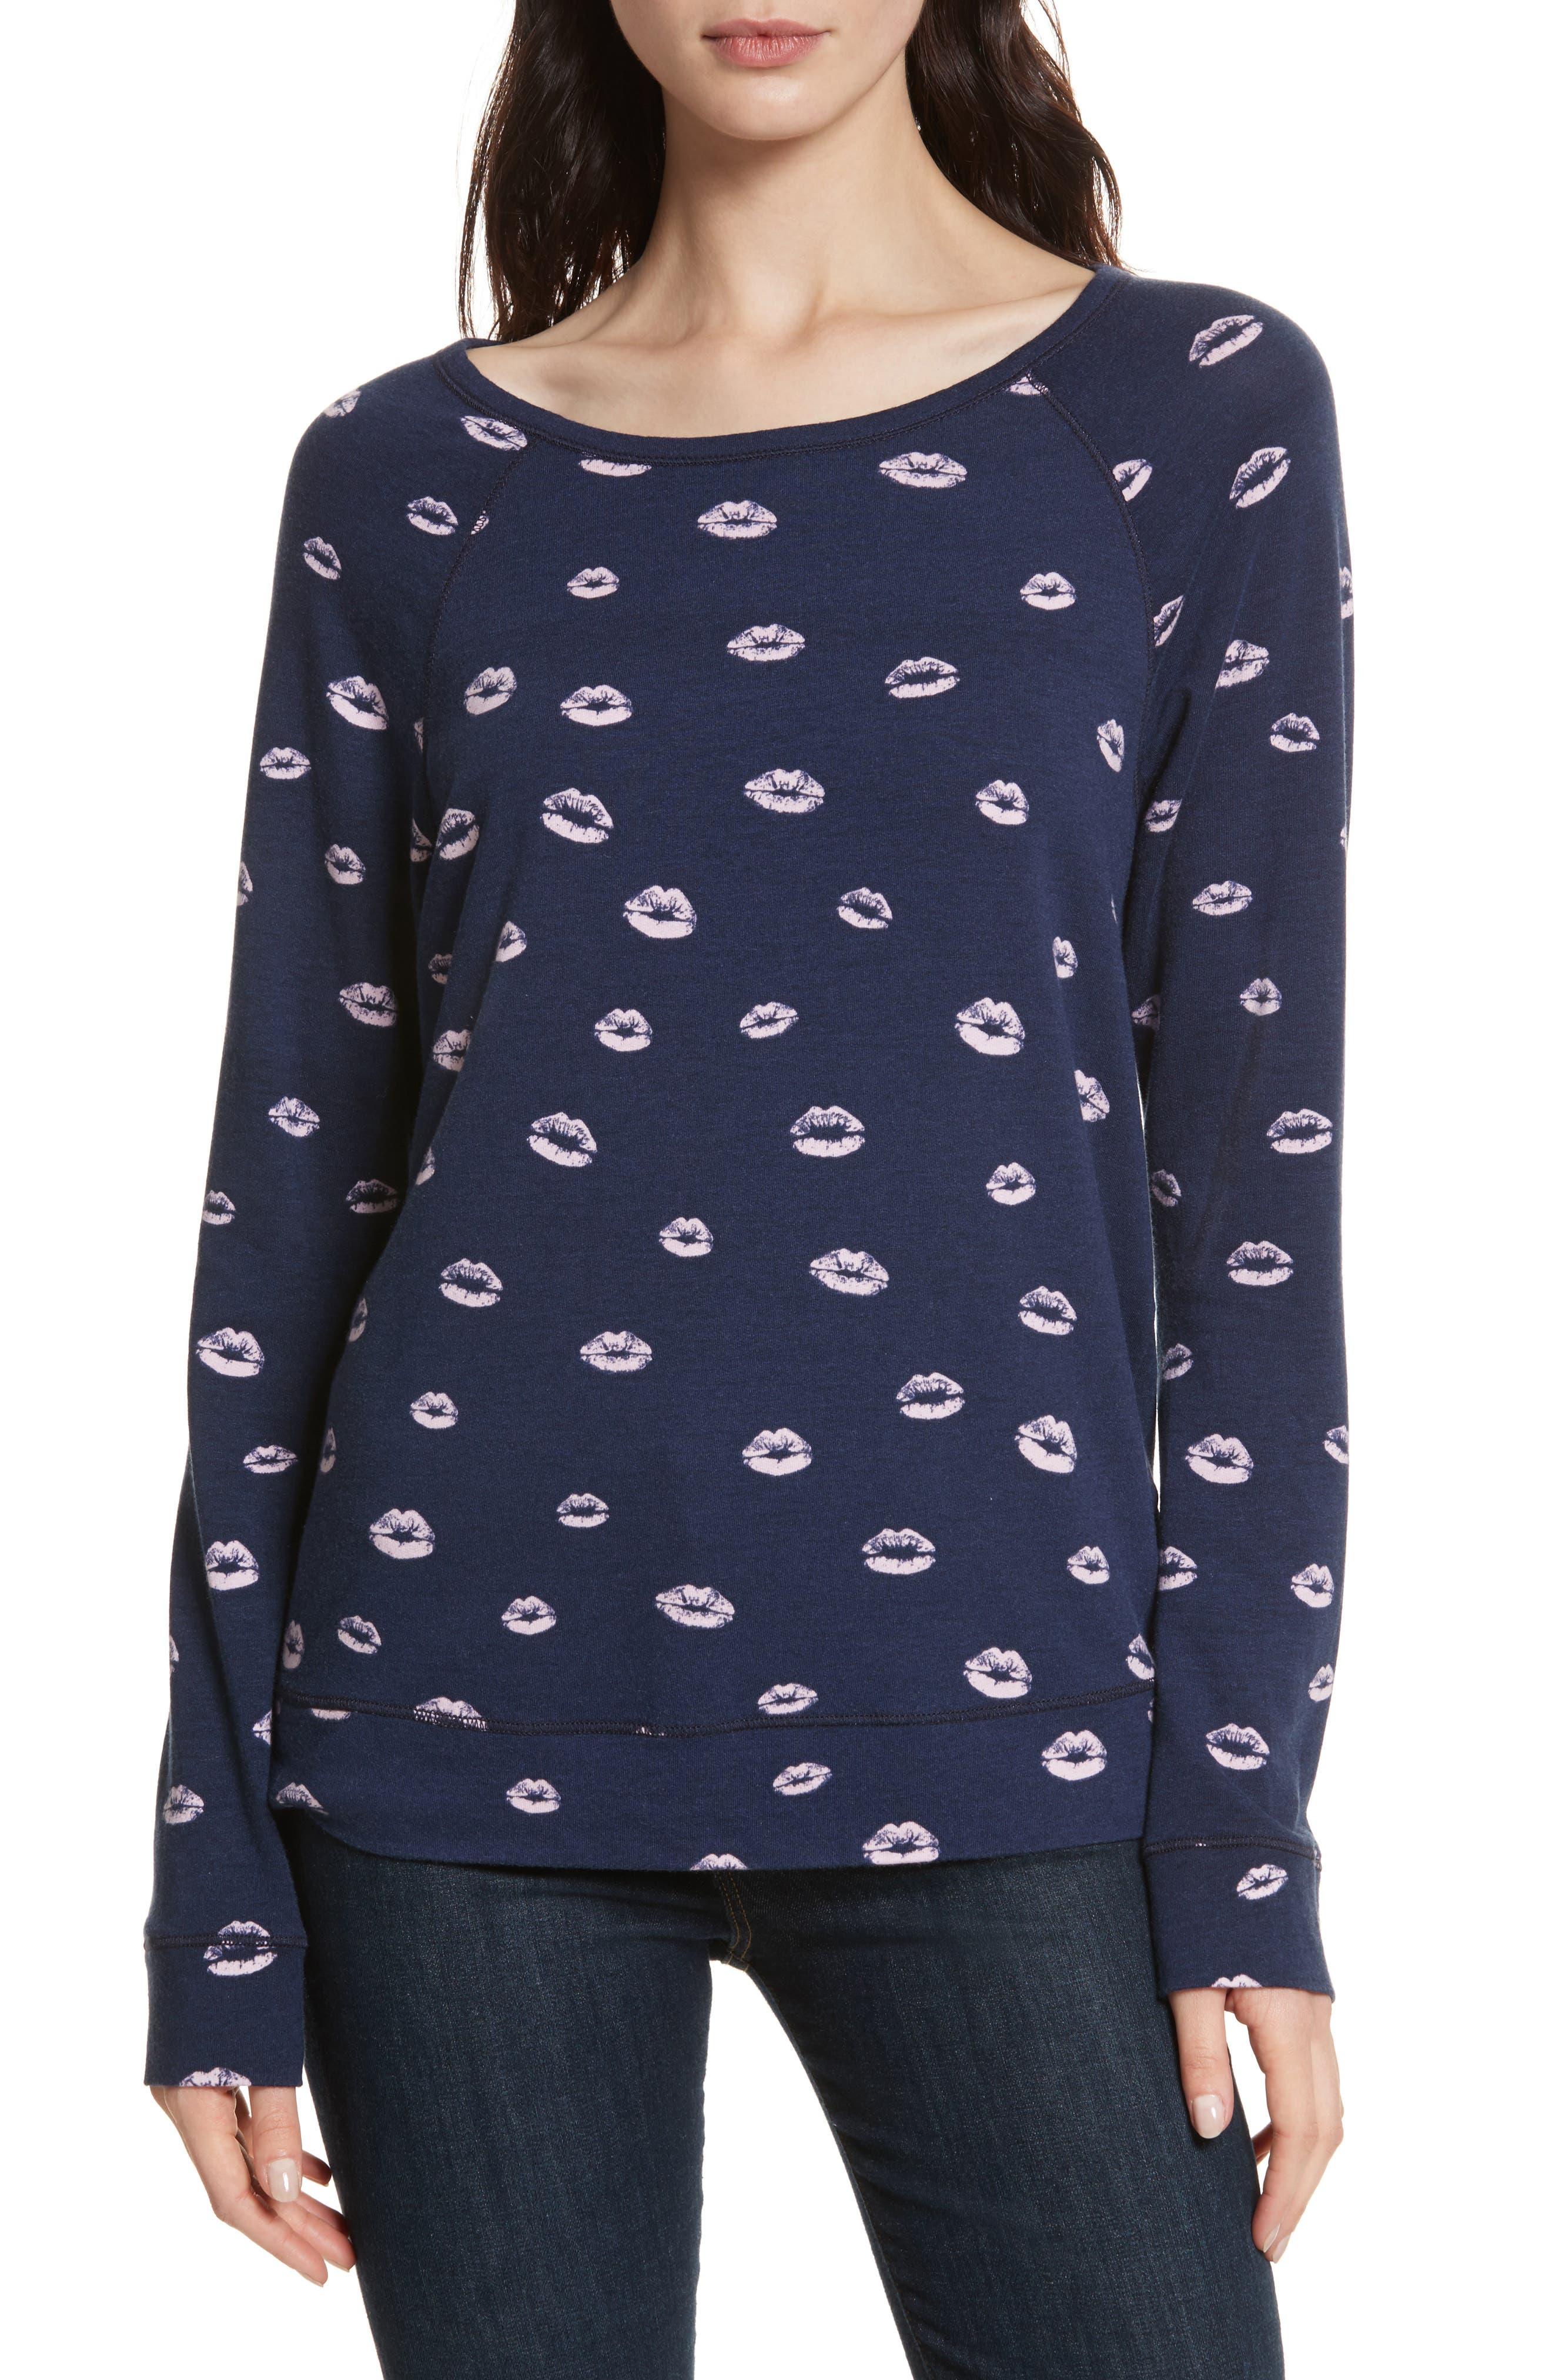 Annora B Kiss Print Sweatshirt,                         Main,                         color, 403